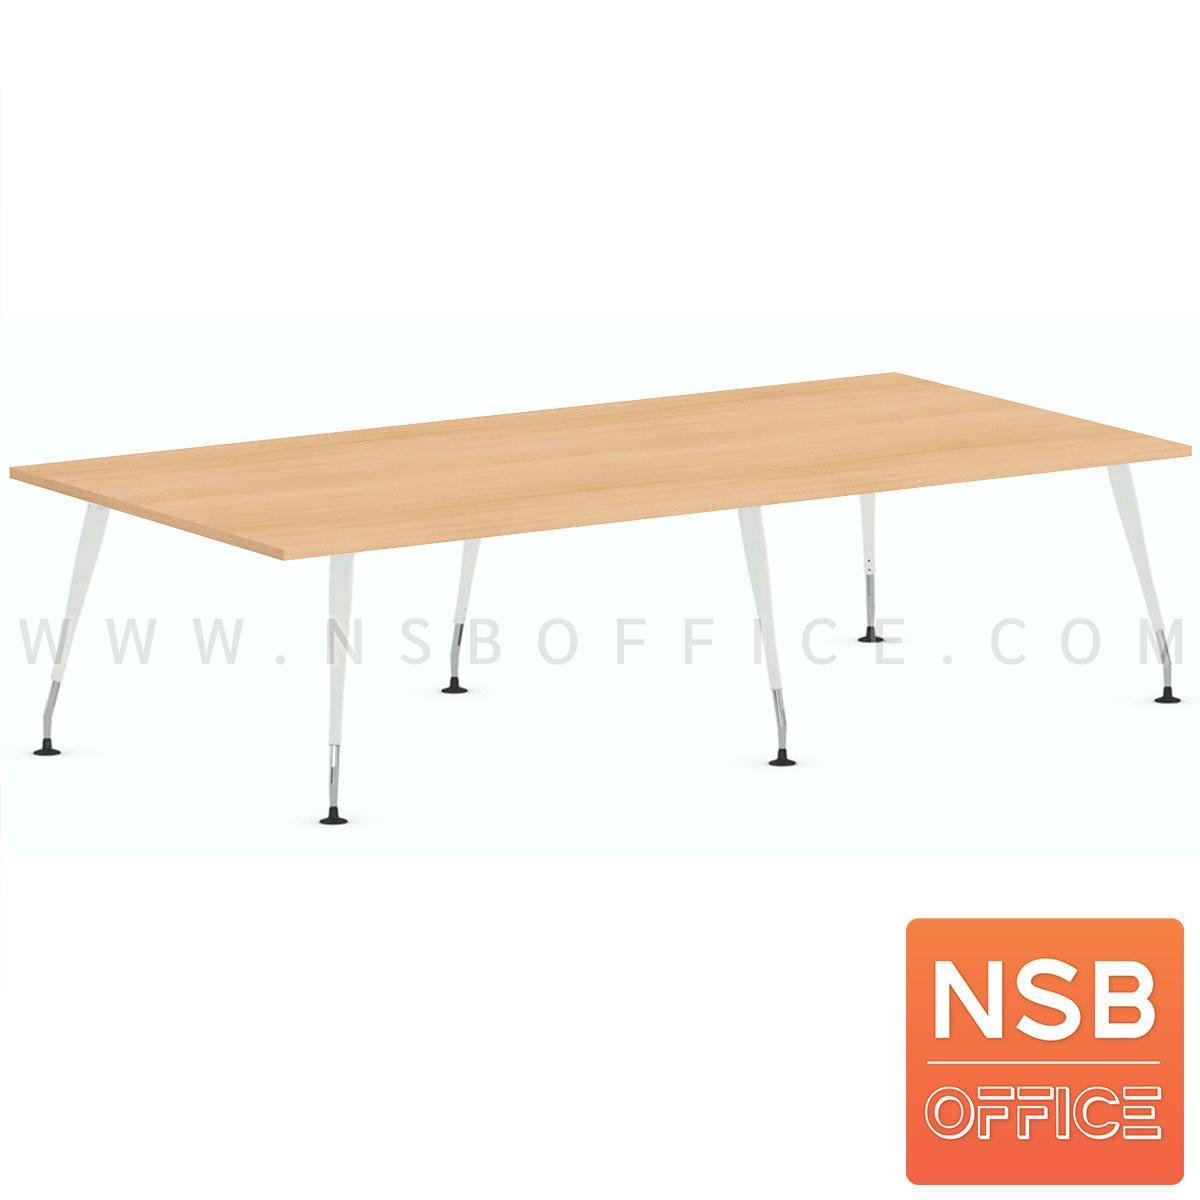 A05A232:โต๊ะประชุมทรงสี่เหลี่ยม  รุ่น Maroon (มาร์รูน) ขนาด 240W*120D cm. ขาเหล็ก